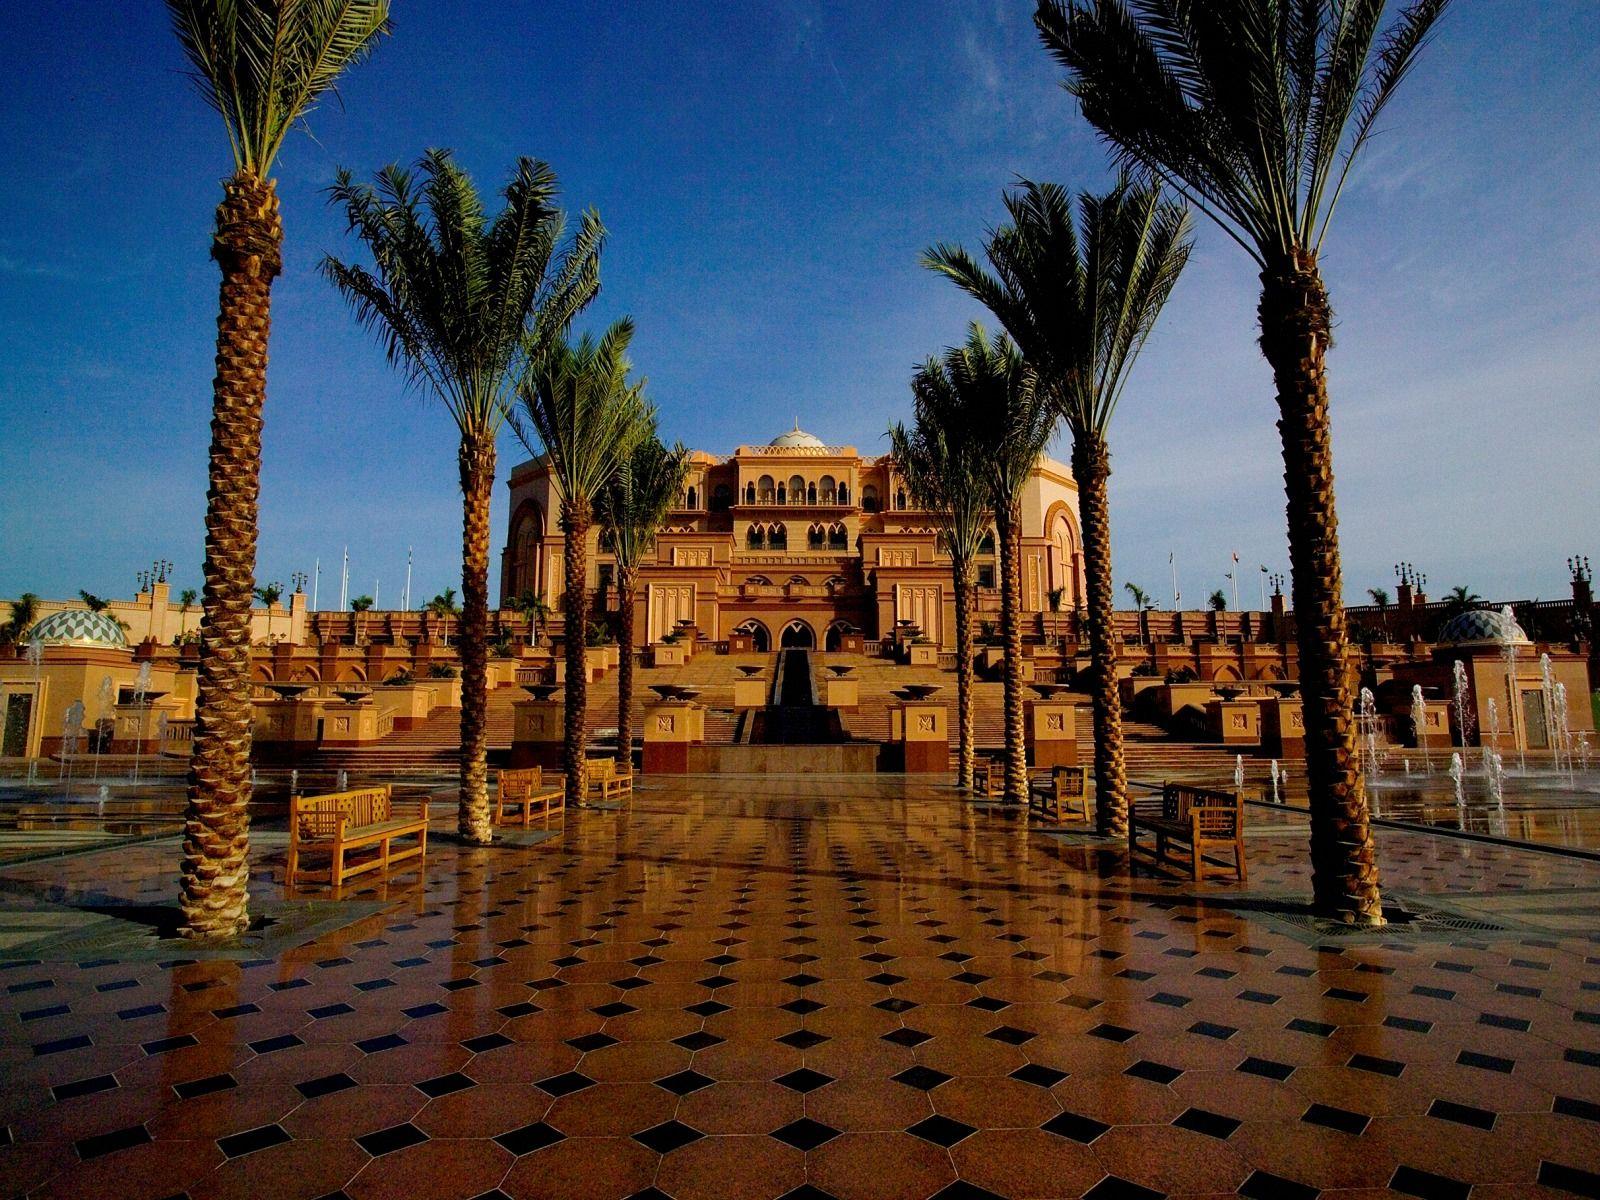 The Emirates Palace a luxury hotel in Abu Dhabi United Arab